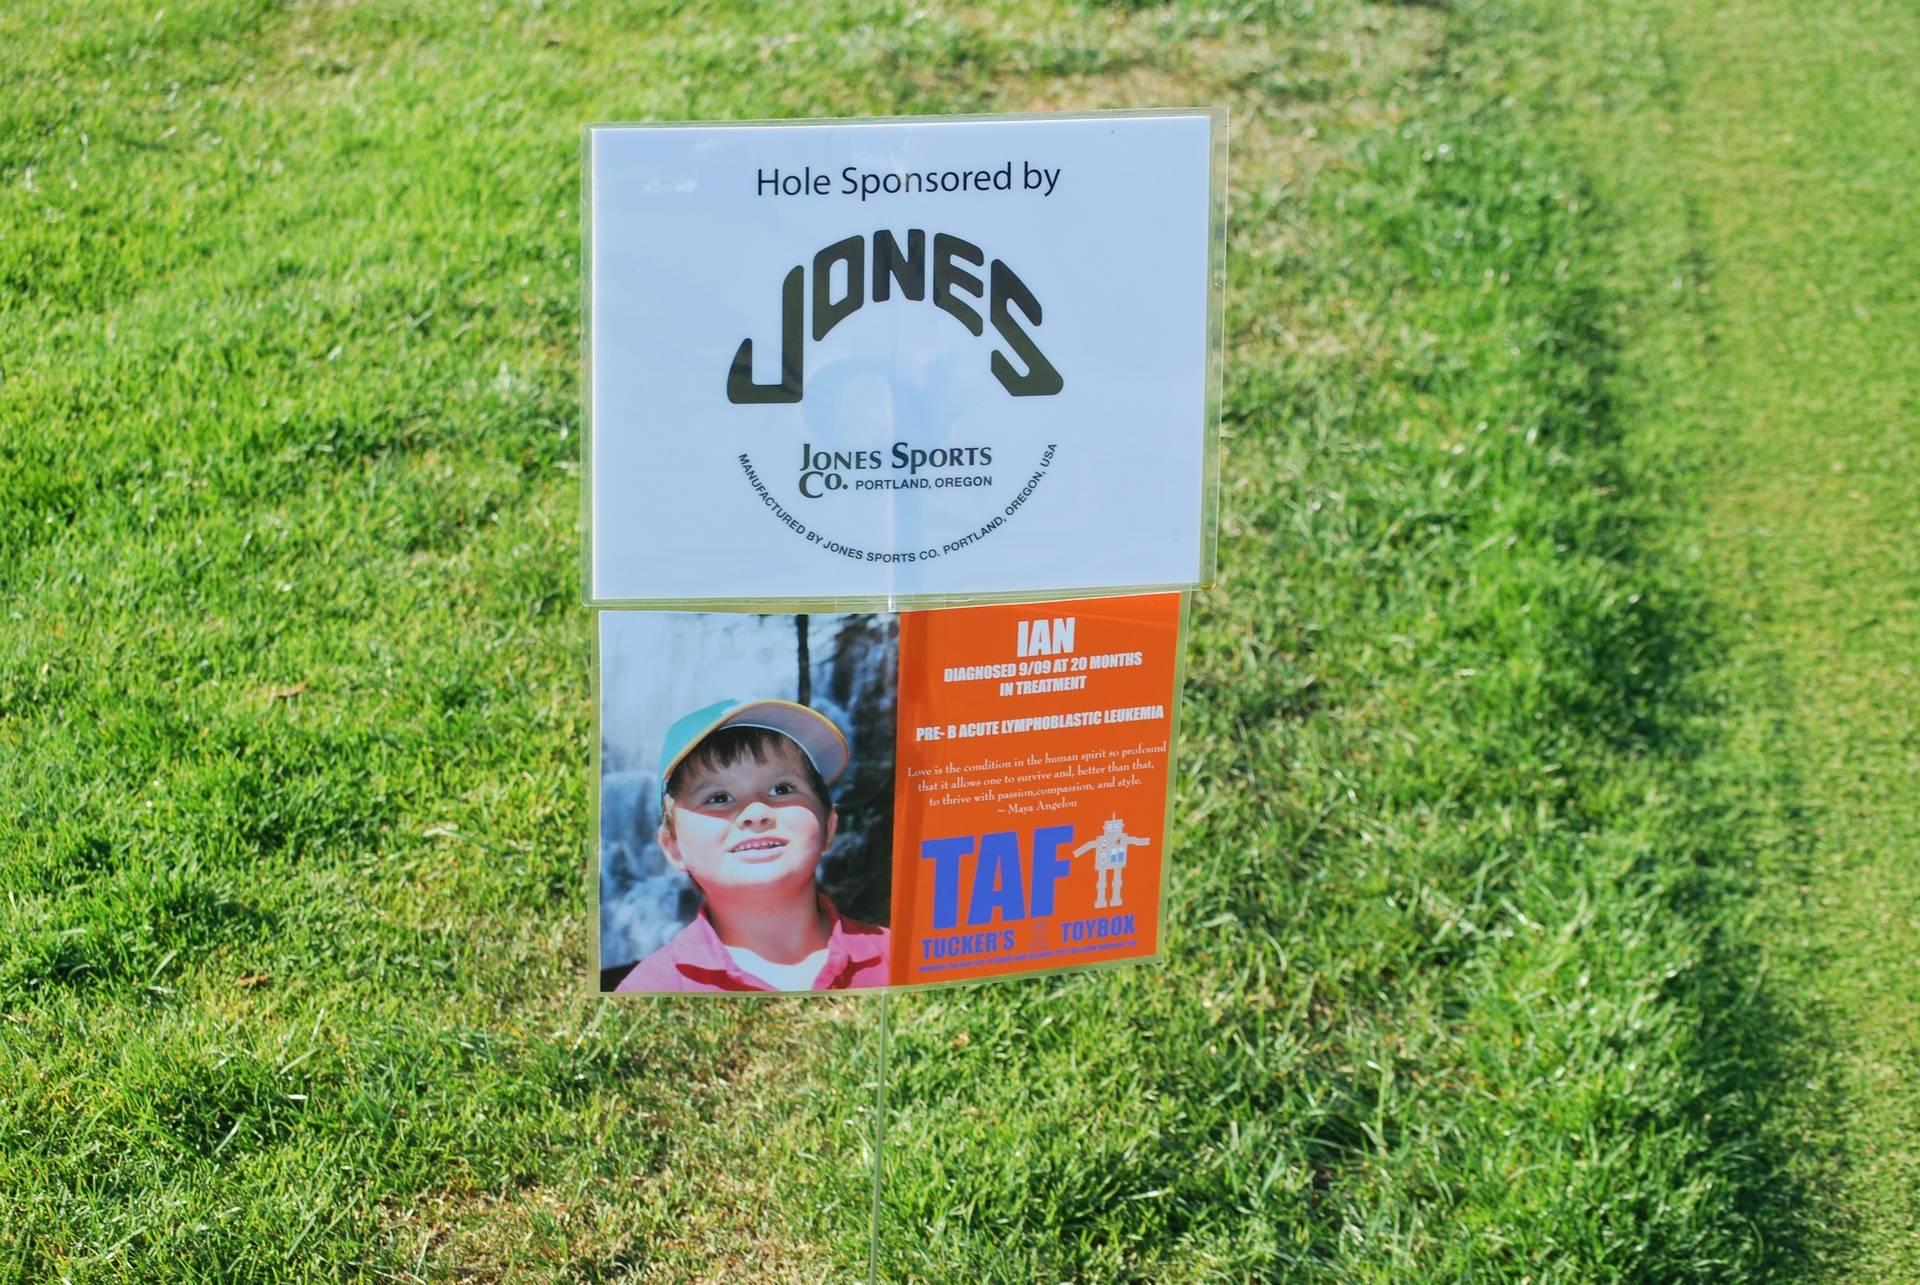 Hole Sponsored by Jones Sports Co.